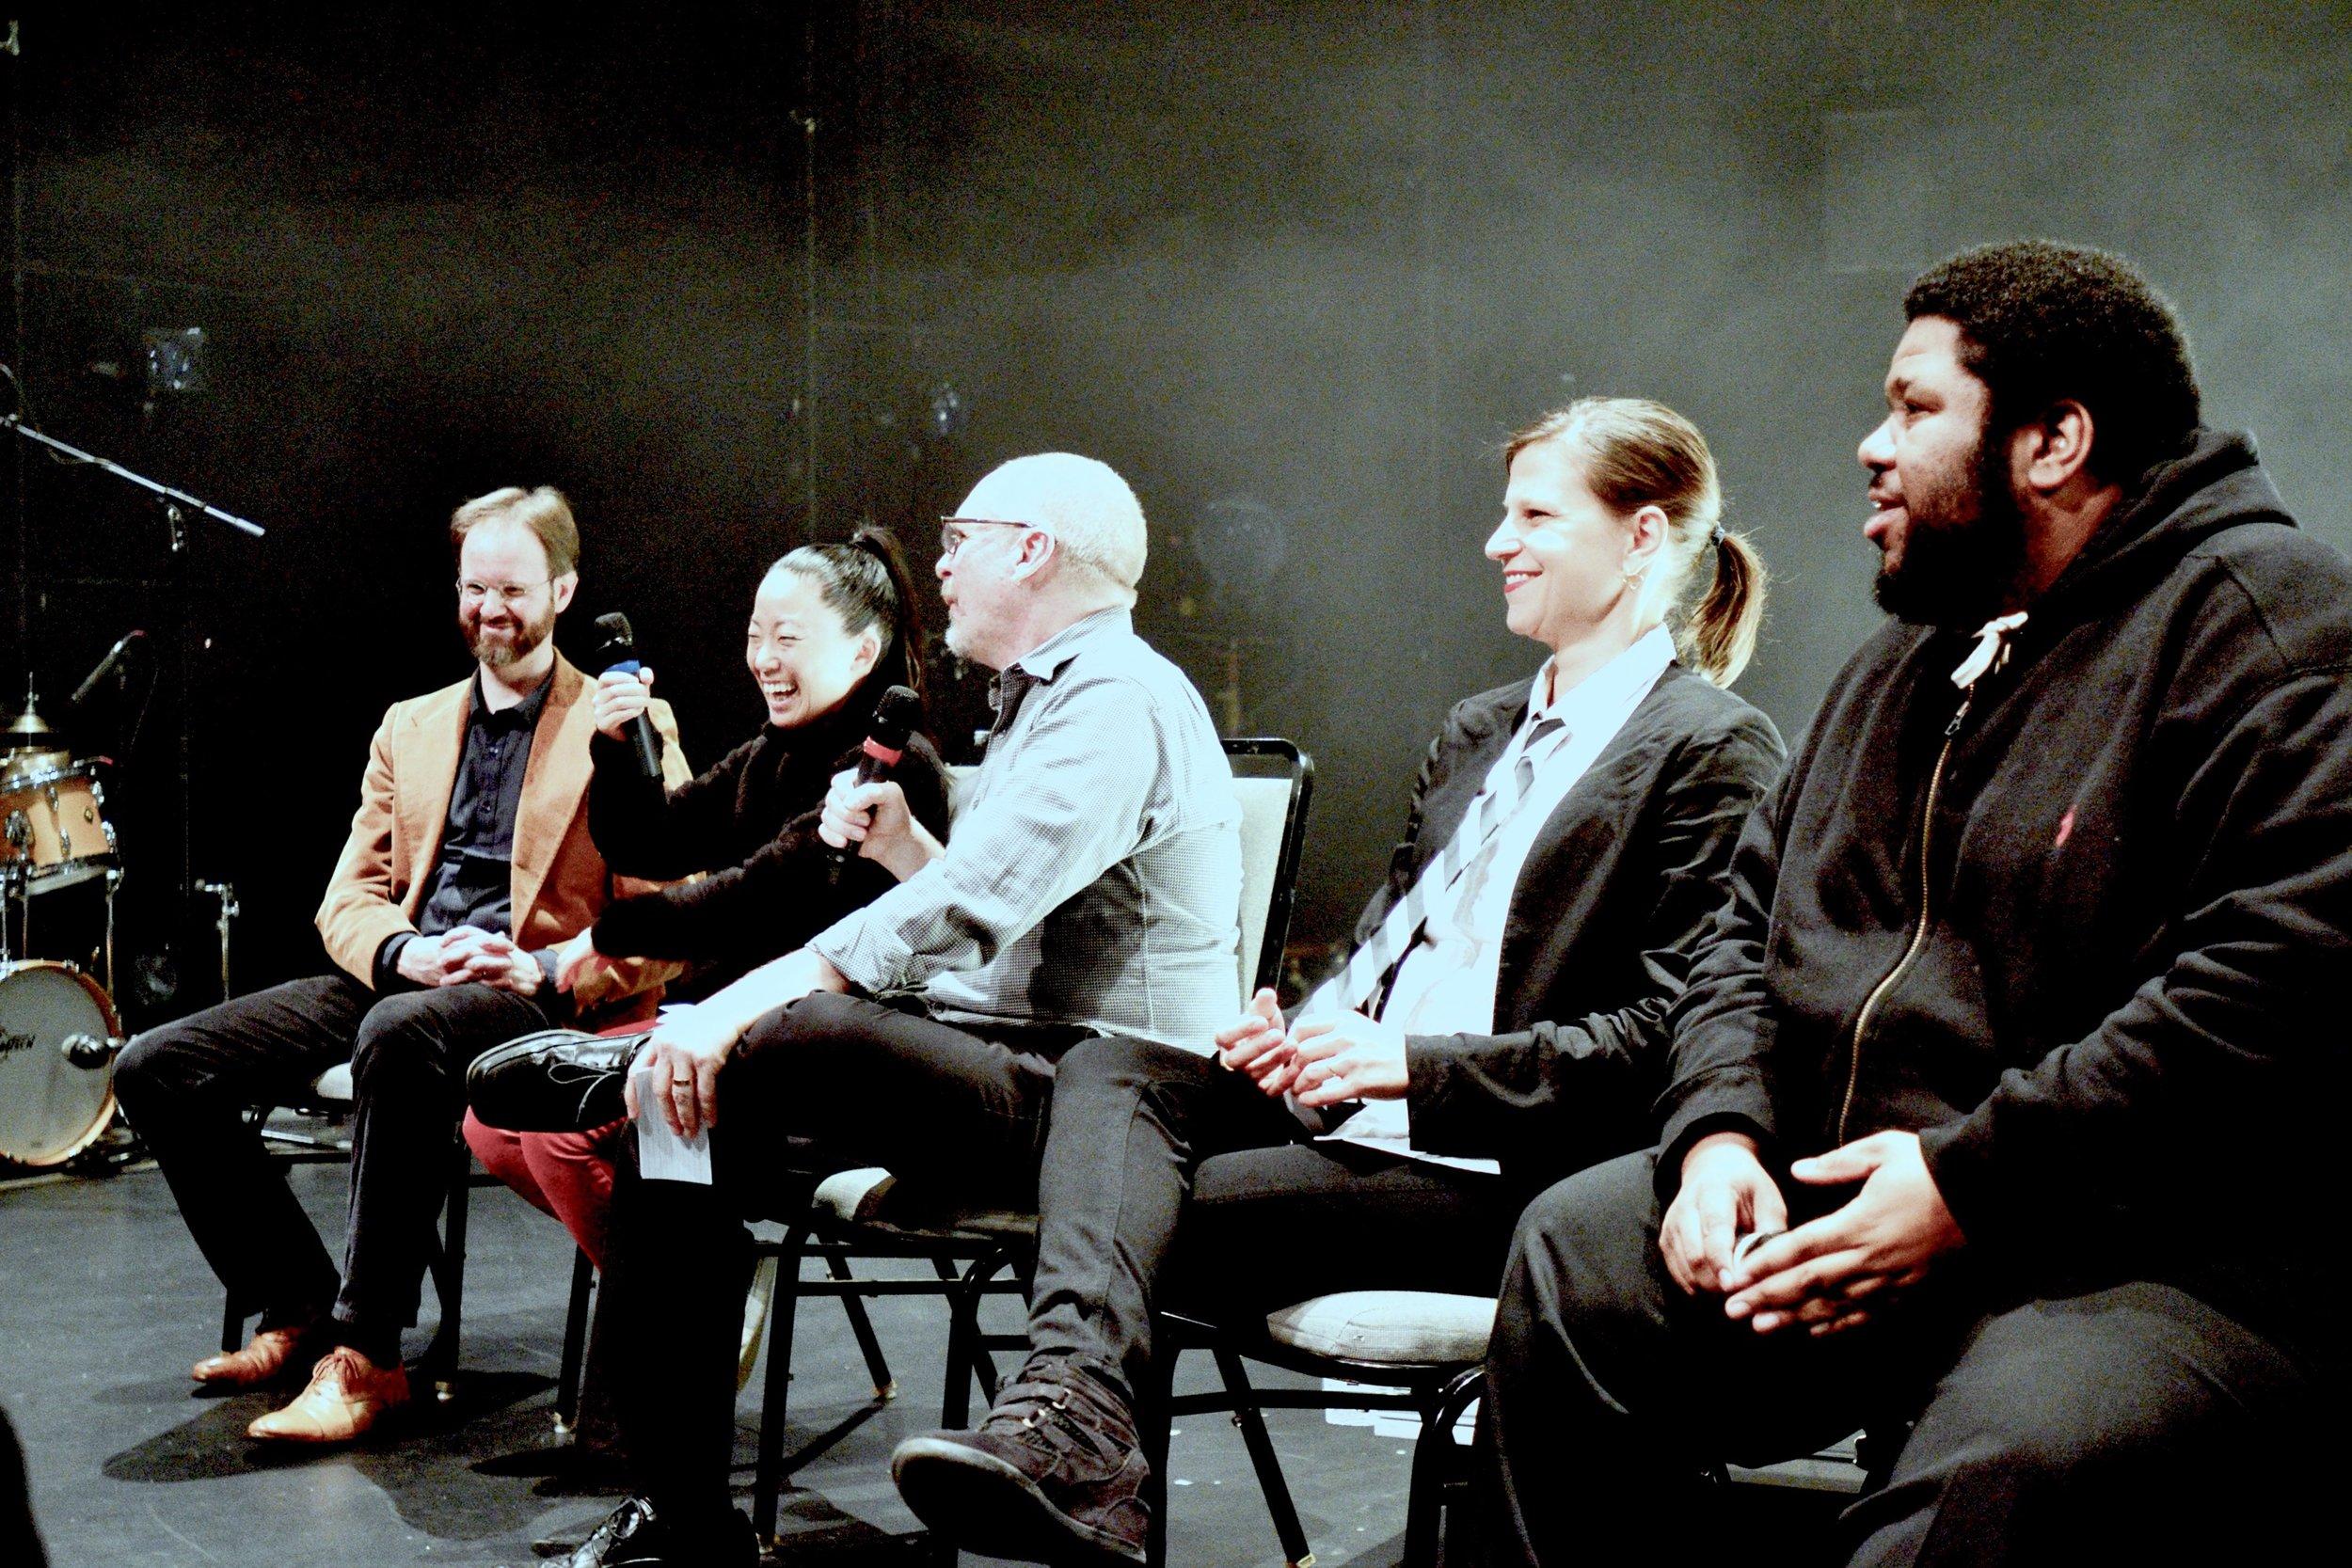 Richard Beaudoin, Pauchi Sasaki, Steve Smith, Suzanne Farrin, and Tyshawn Sorey at The Kitchen, New York